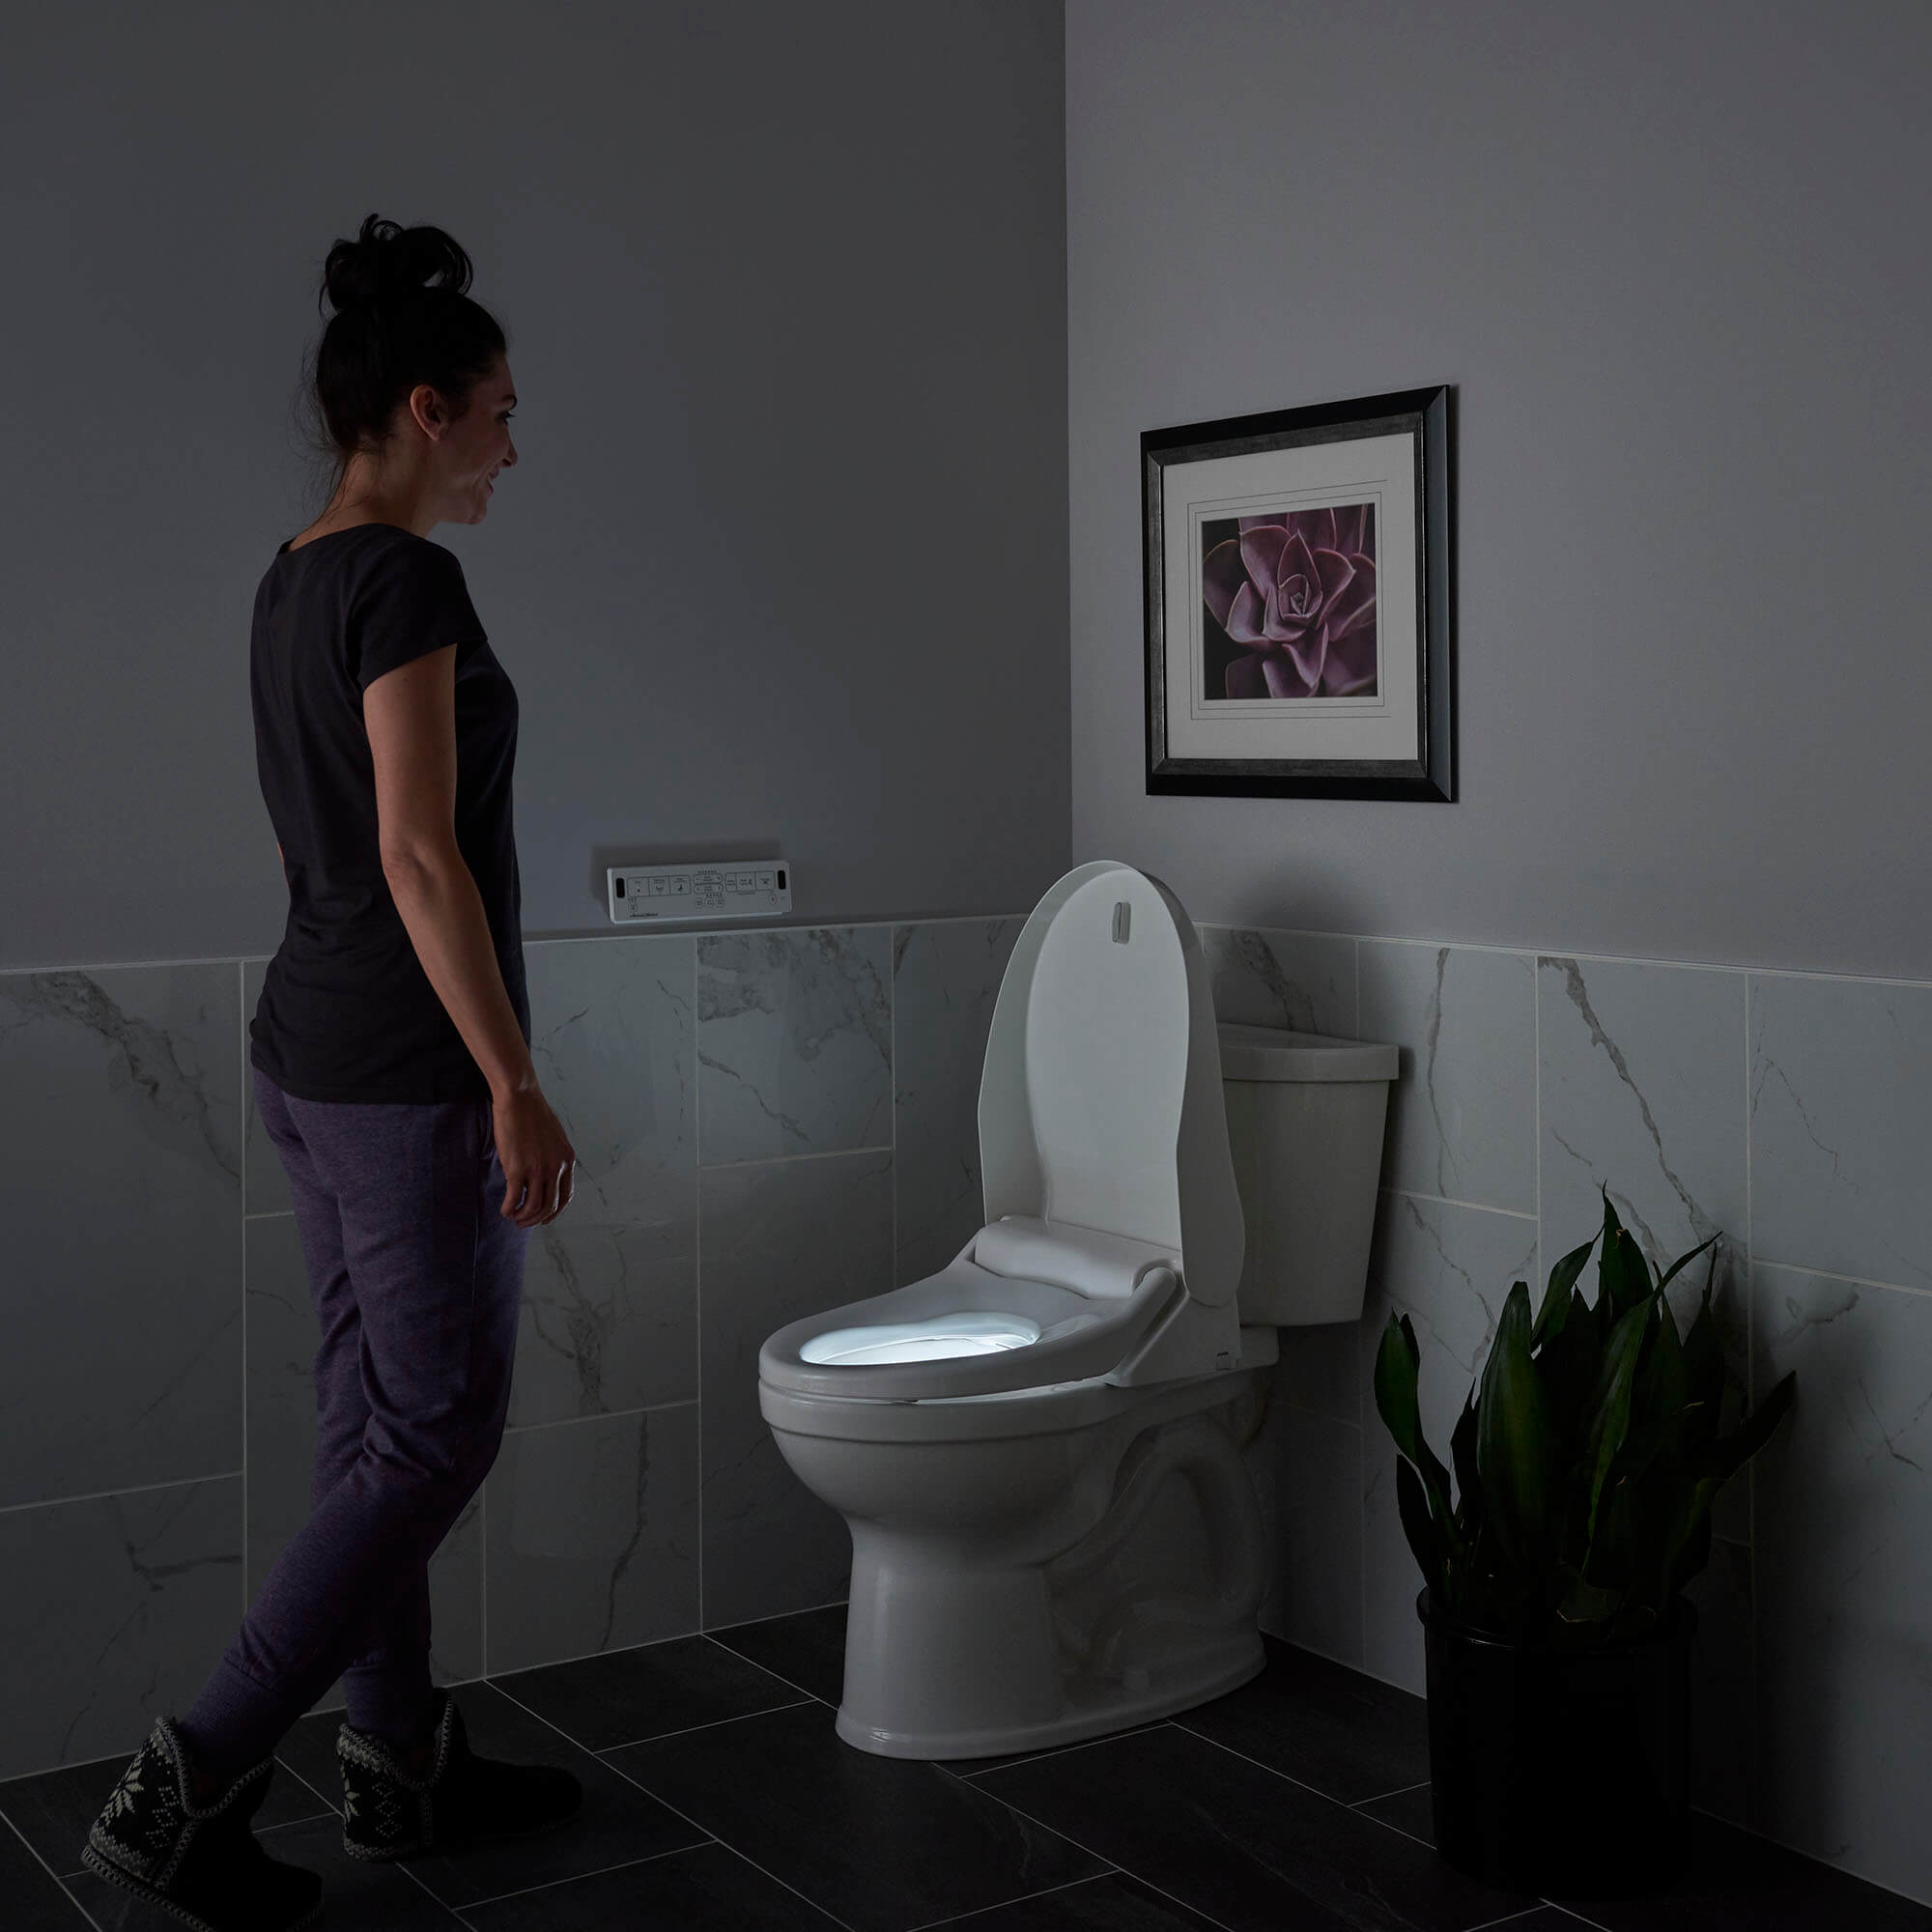 spalet toilet seat